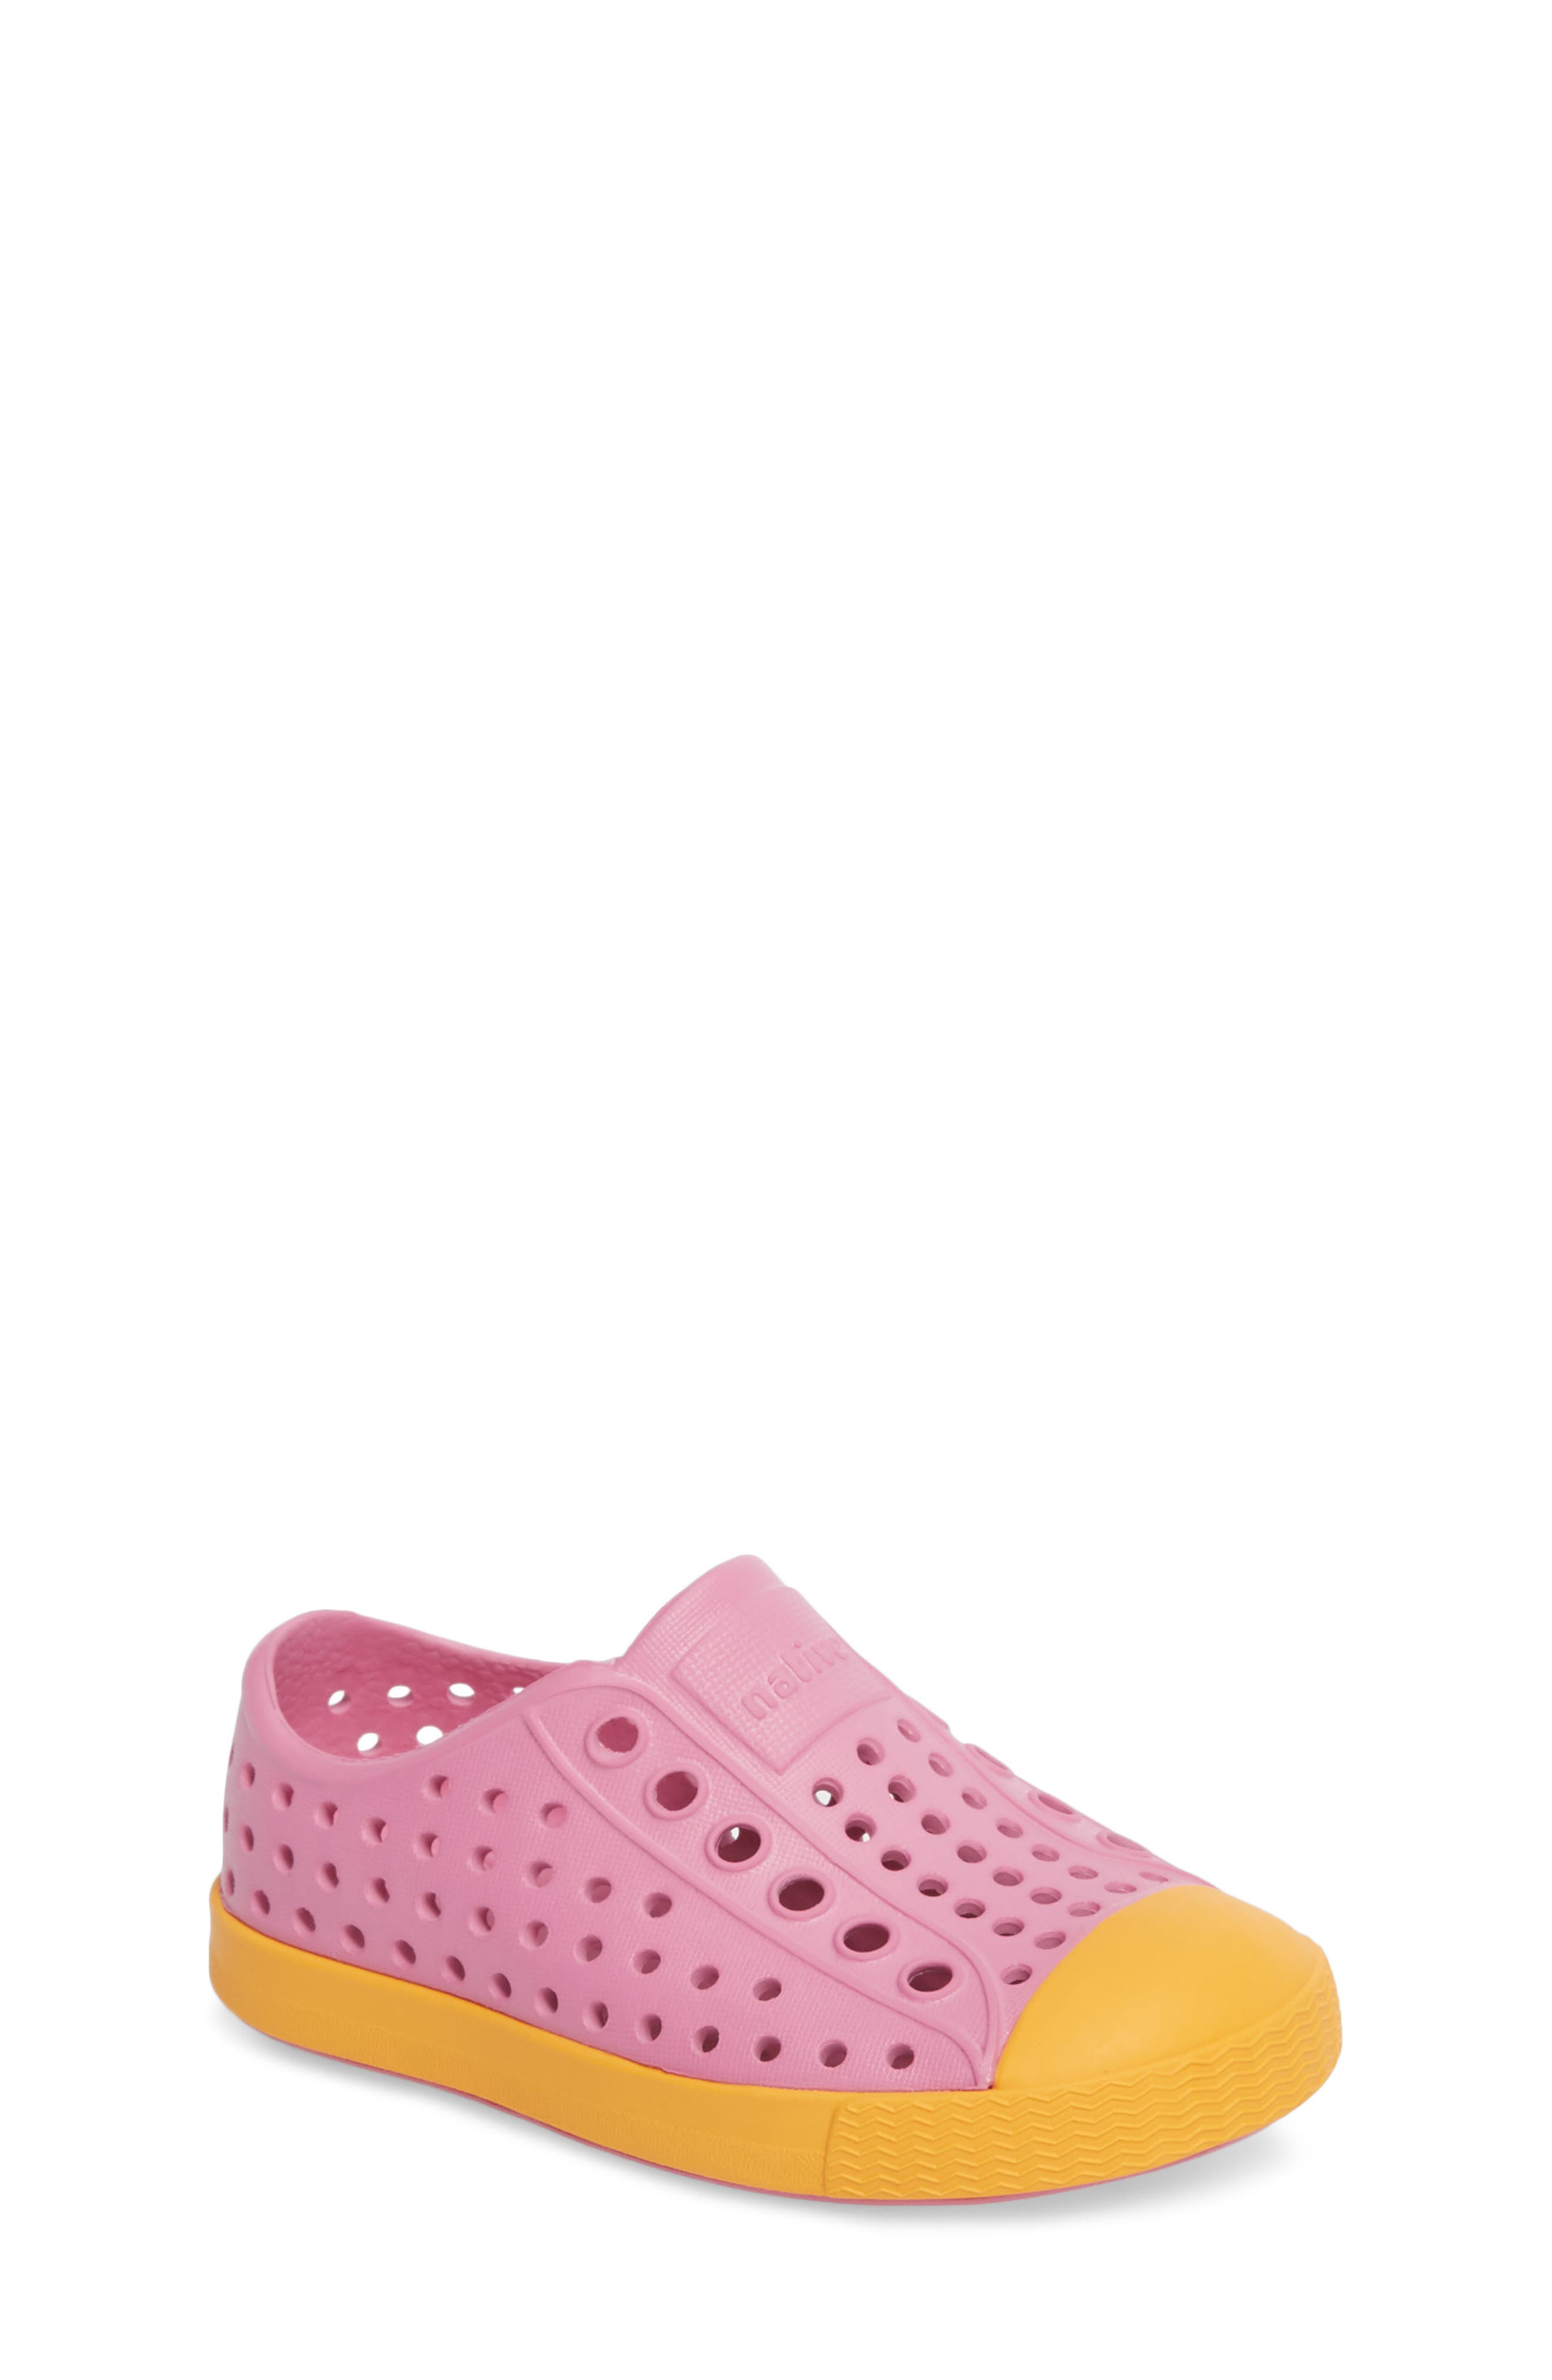 'Jefferson' Water Friendly Slip-On Sneaker,                             Main thumbnail 24, color,